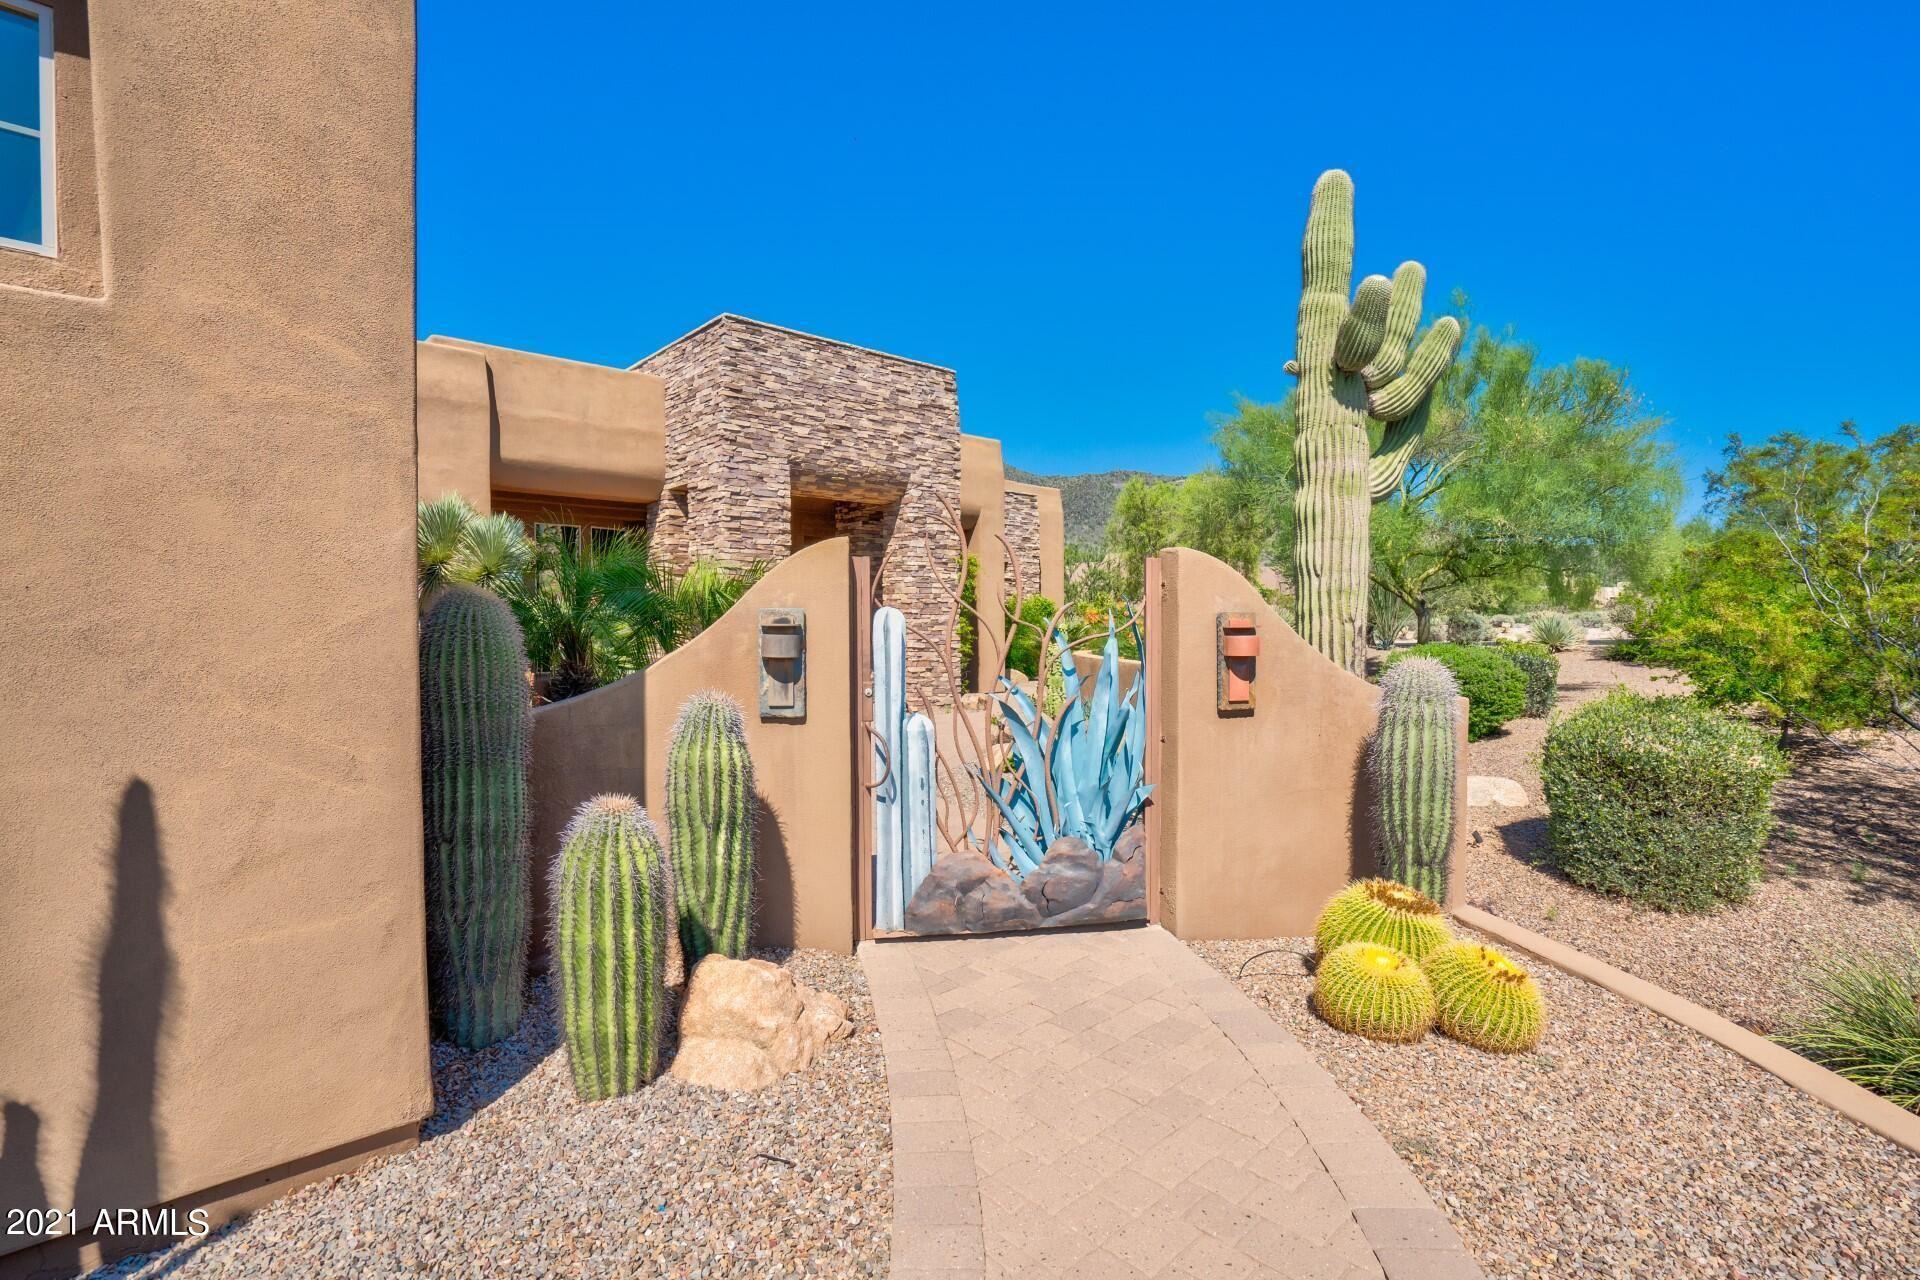 Photo of 5690 E CANYON CREEK Circle, Carefree, AZ 85377 (MLS # 6285644)